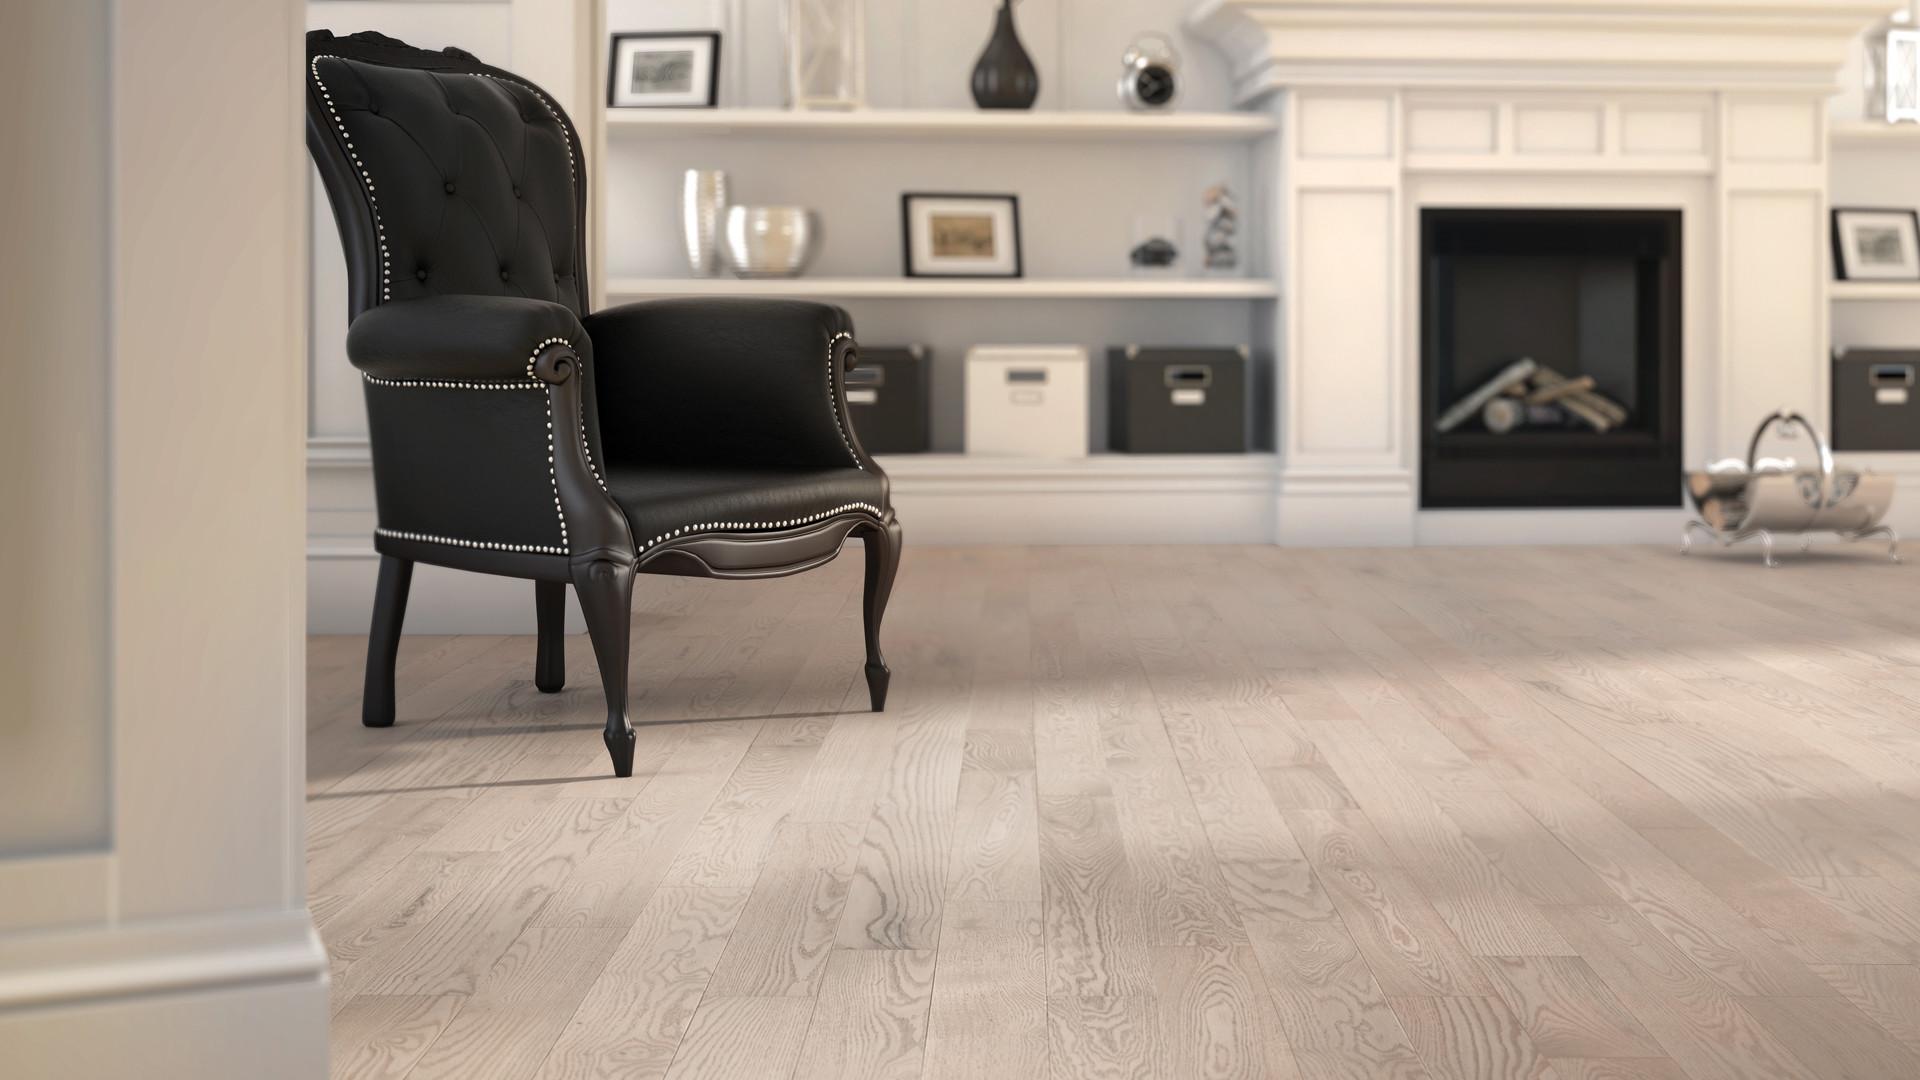 2 1 2 hardwood flooring of does hardwood floor hardness matter lauzon flooring throughout 4 plank construction